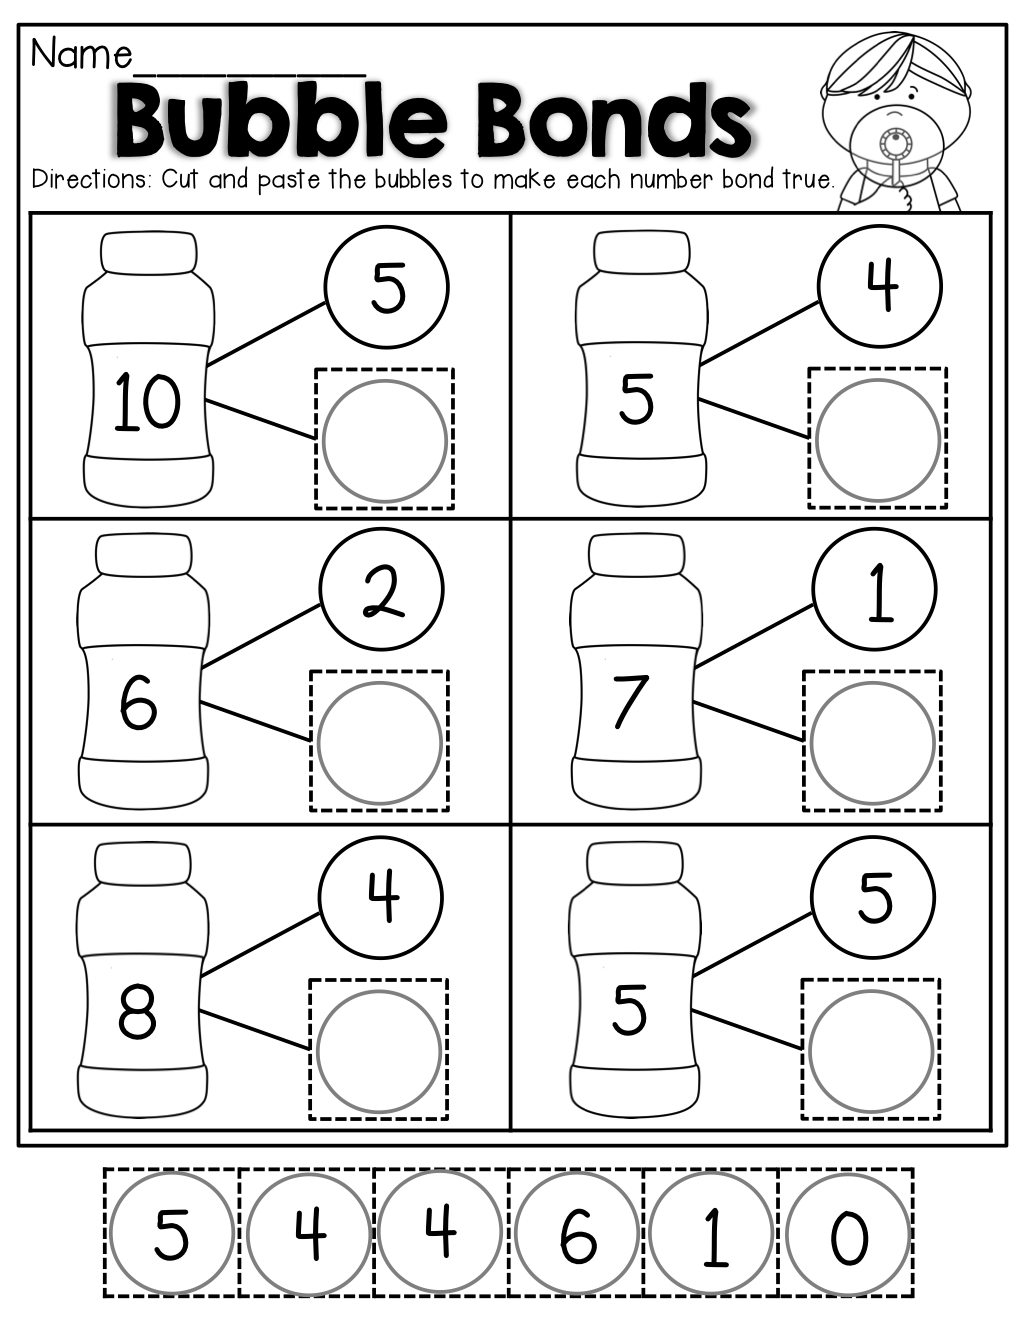 Number Bubble Bonds (Cut And Paste) | Kindergarten Activities - Free Printable Number Bond Template